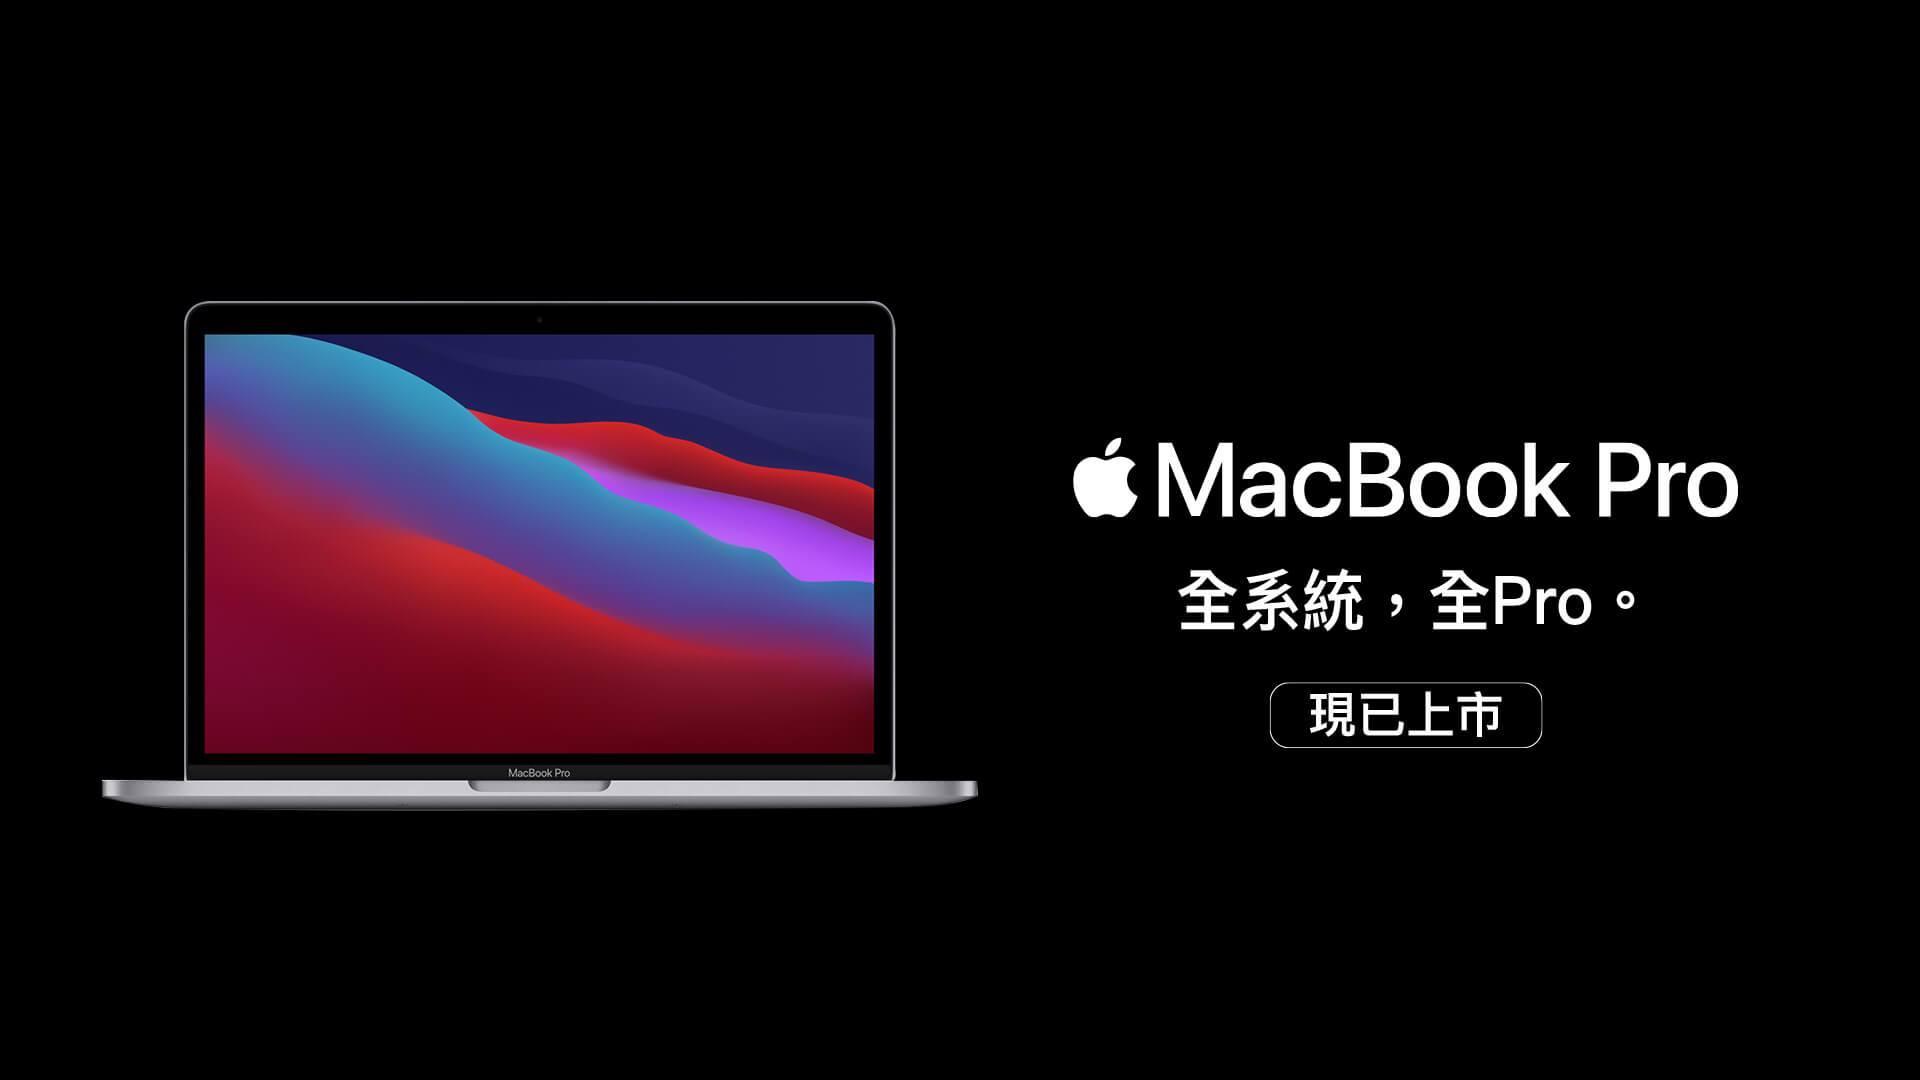 MacBook Pro 13吋